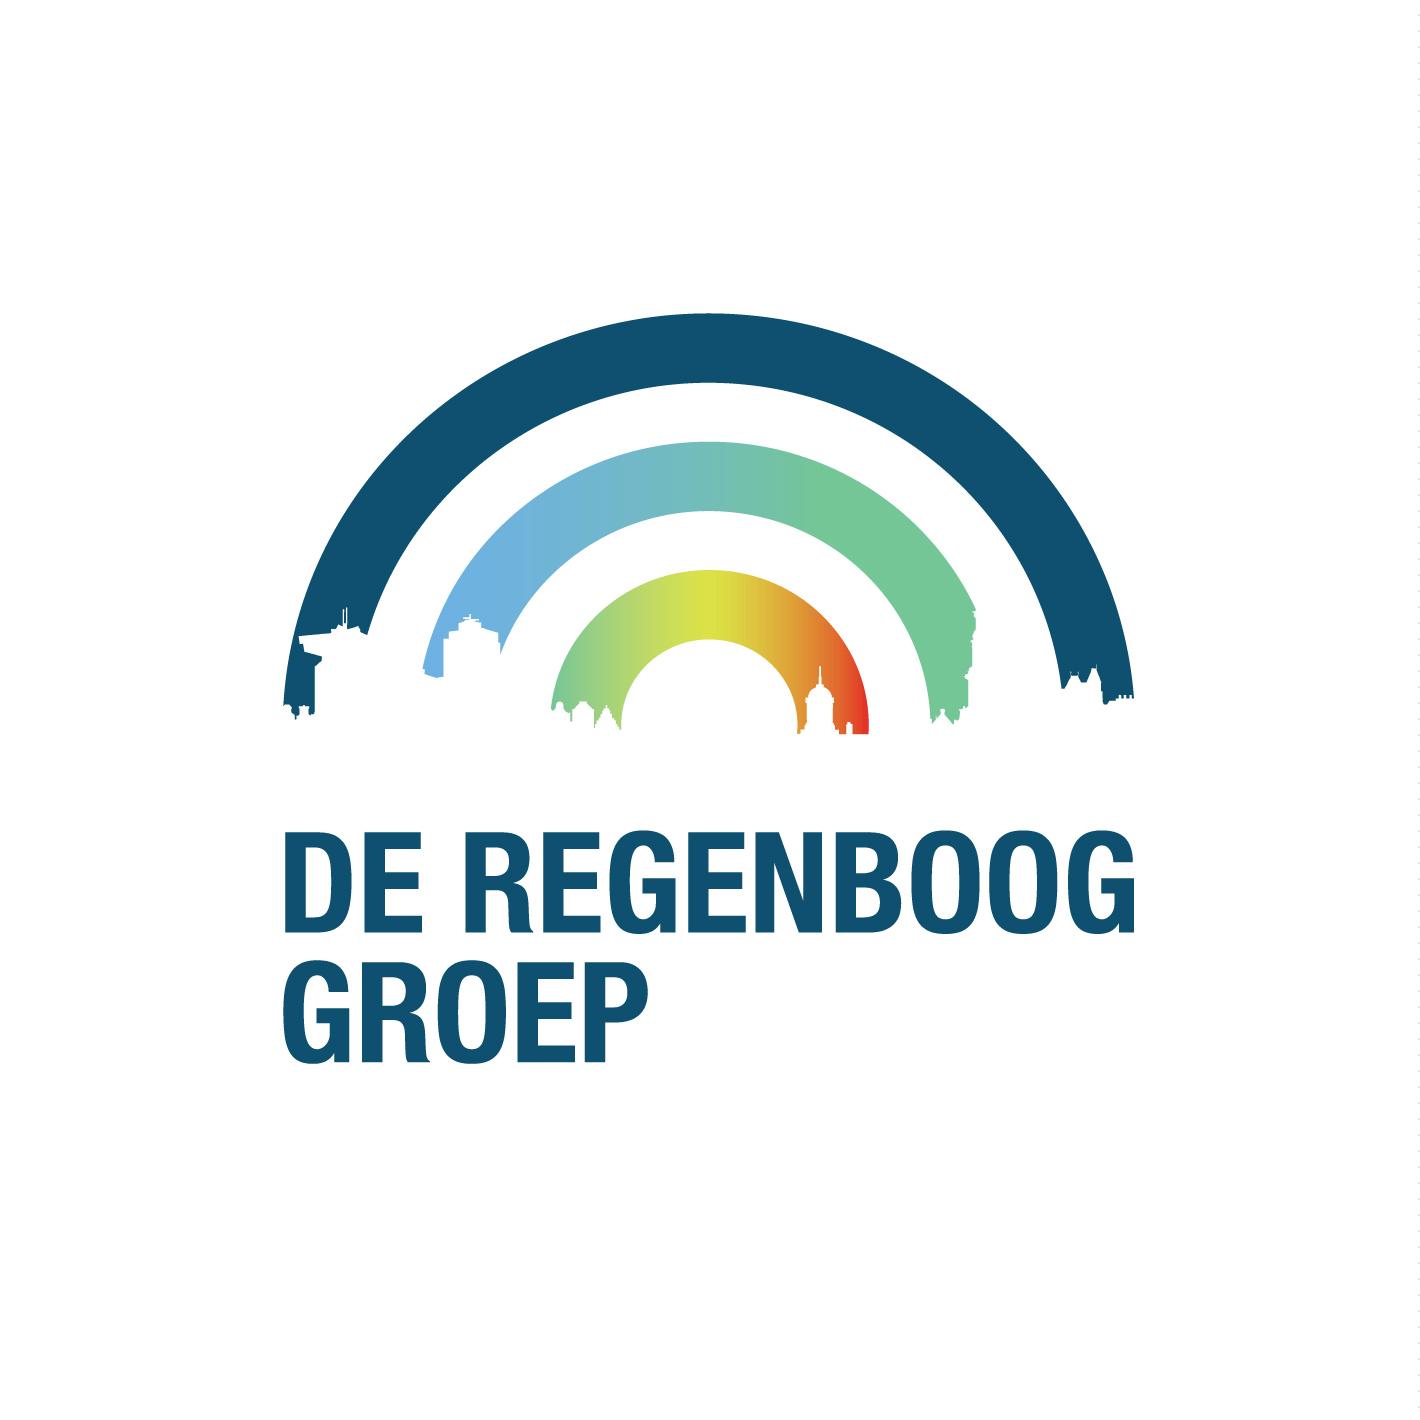 Nx154xlogo-de-regenboog-groep-id-40189.b63d1c.jpg.pagespeed.ic.UFGNYuti_y